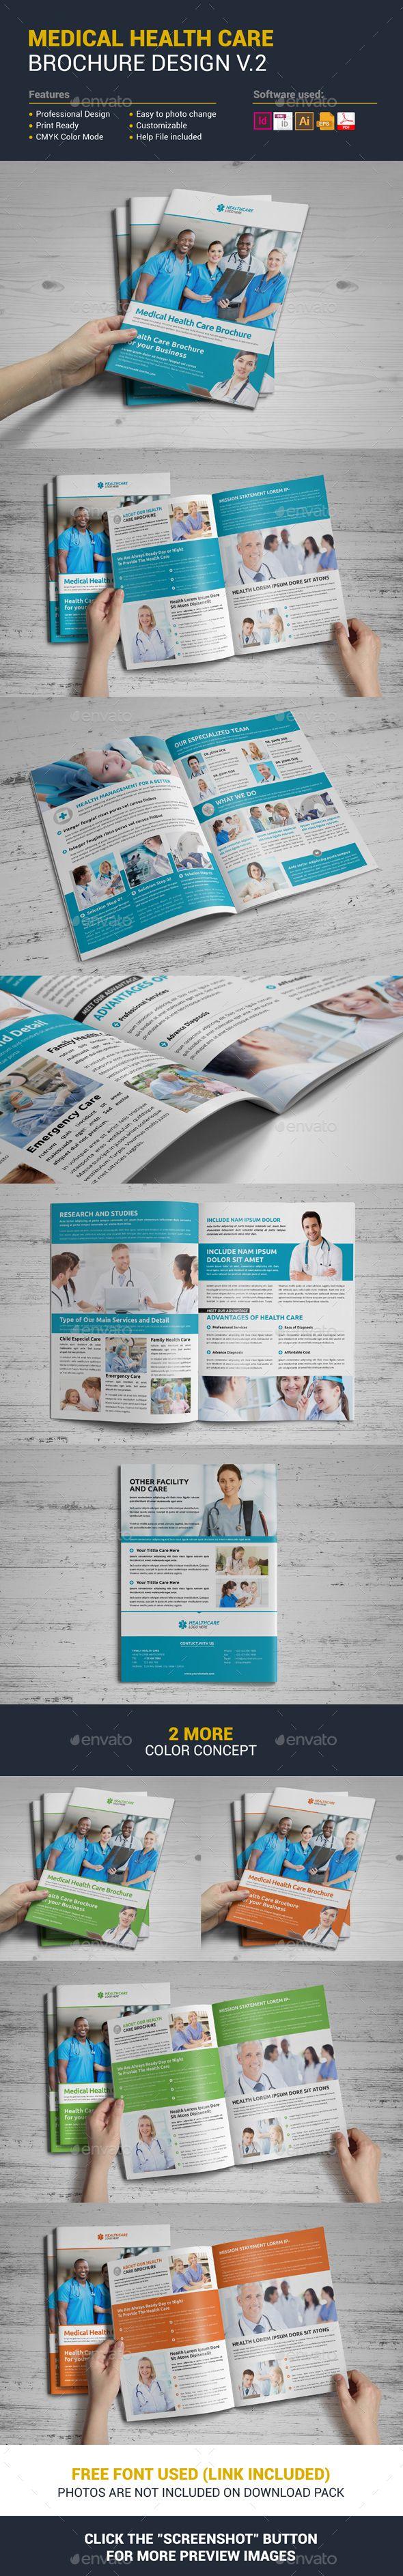 1000 id es propos de medical brochure sur pinterest. Black Bedroom Furniture Sets. Home Design Ideas